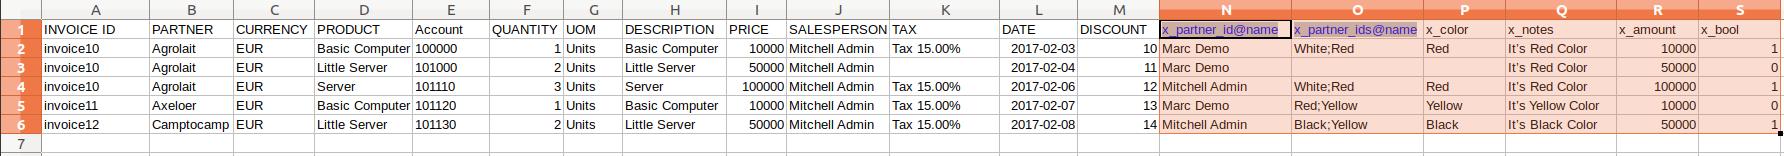 Invoice tax report